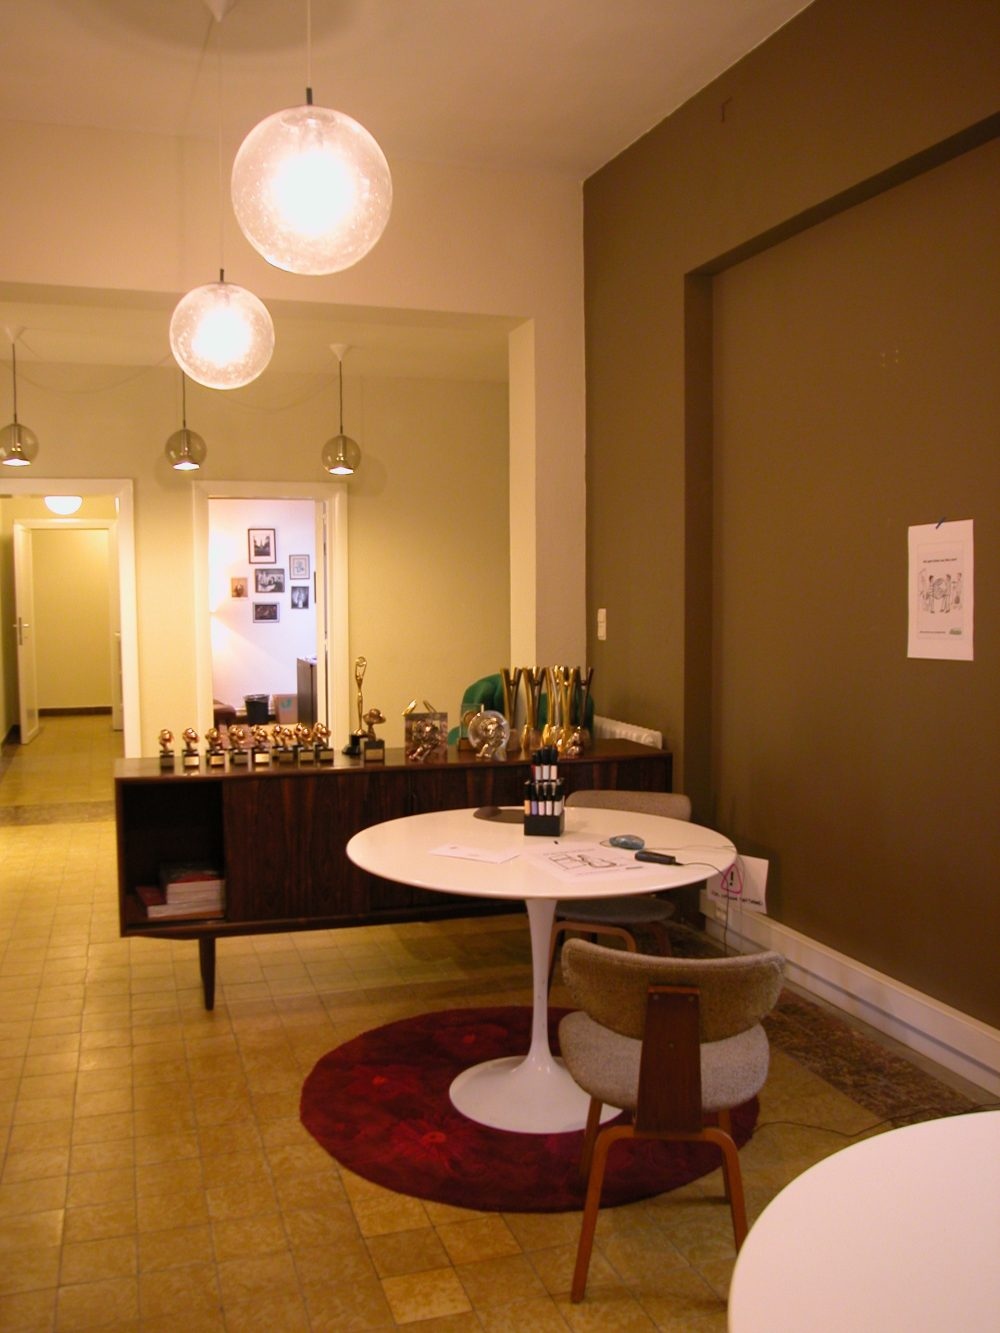 vintage meubelen, kaki wand, witte ronde tafel